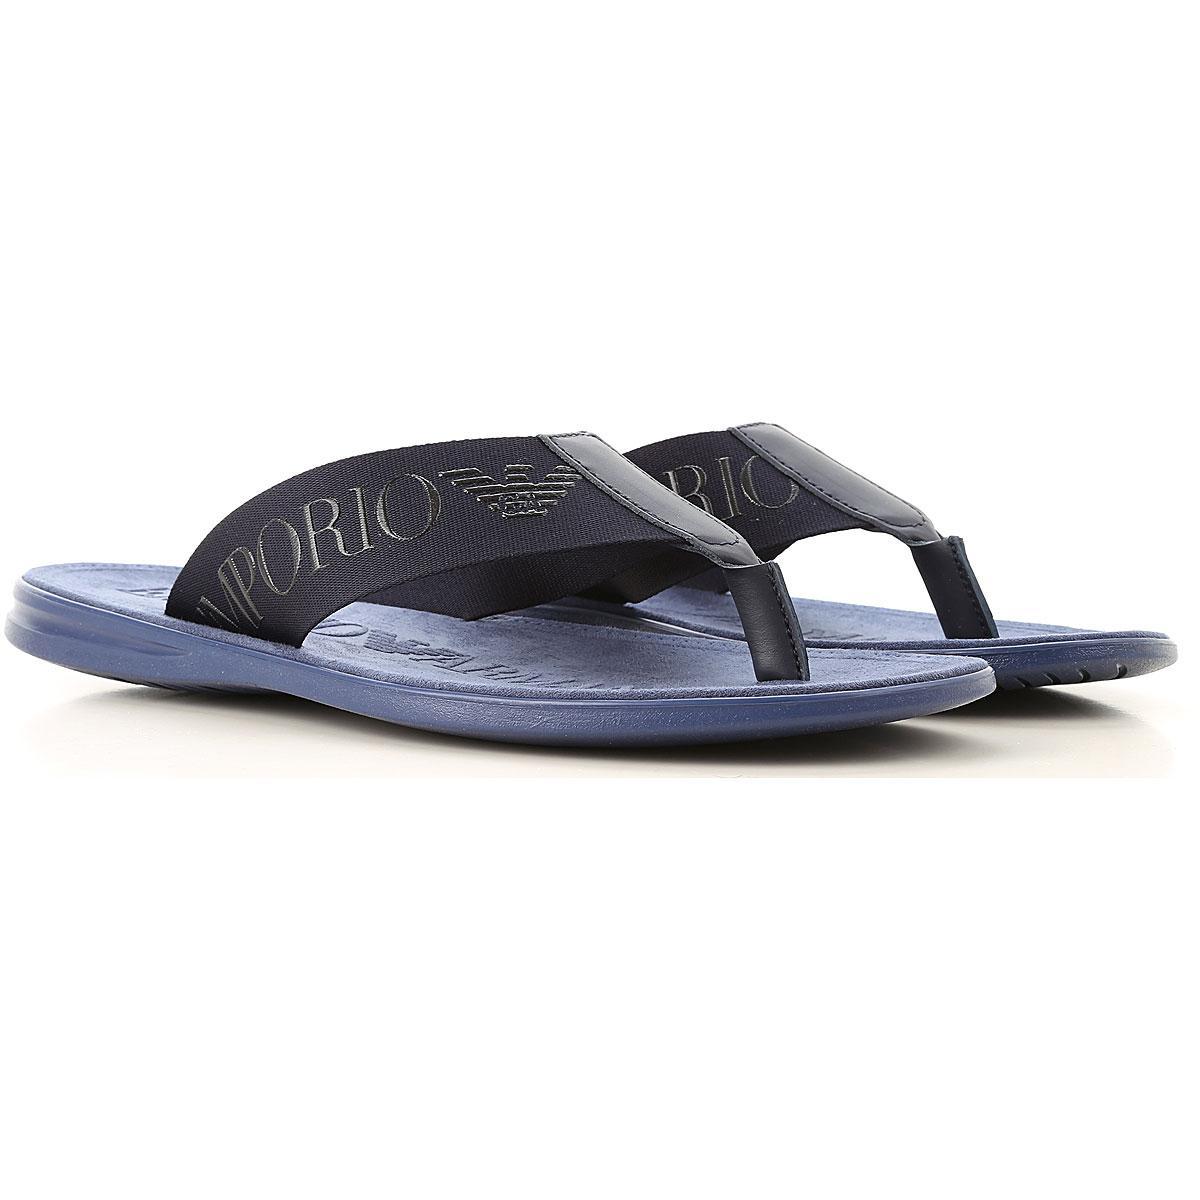 e74cc288071d66 Lyst - Emporio Armani Sandals For Men in Blue for Men